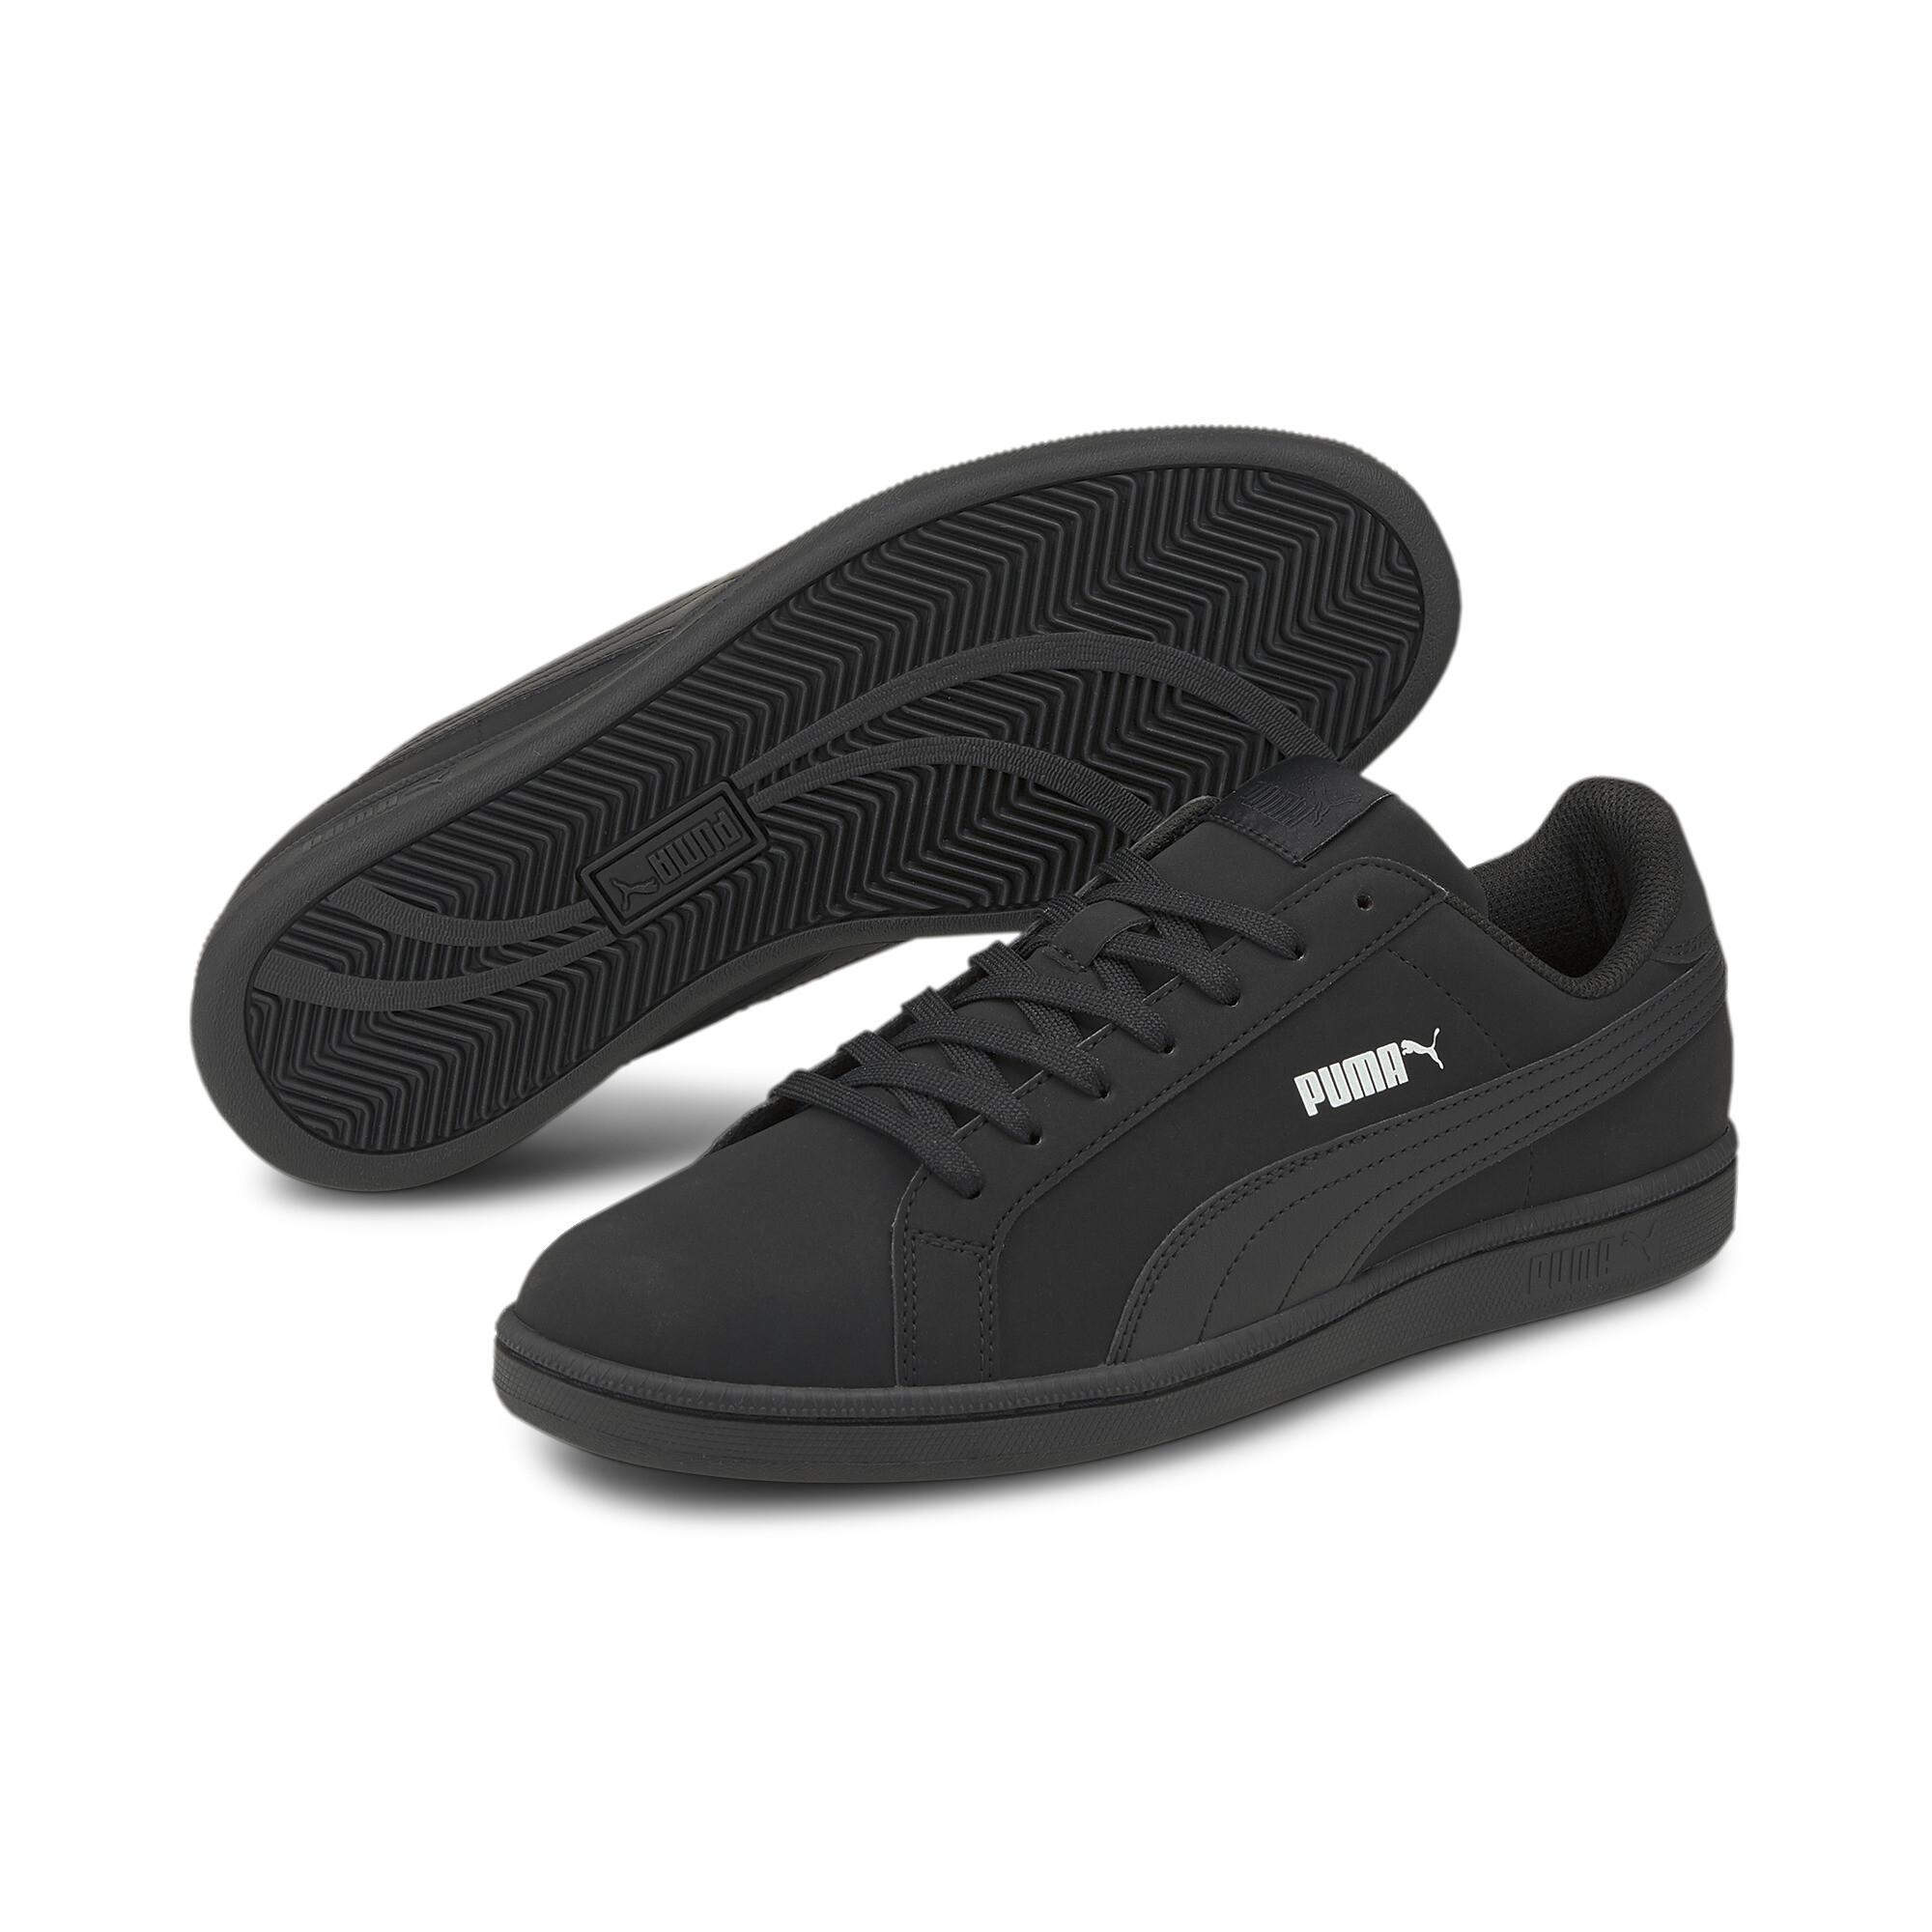 Indexbild 13 - PUMA Smash Buck Sneaker Unisex Schuhe Sport Classics Neu